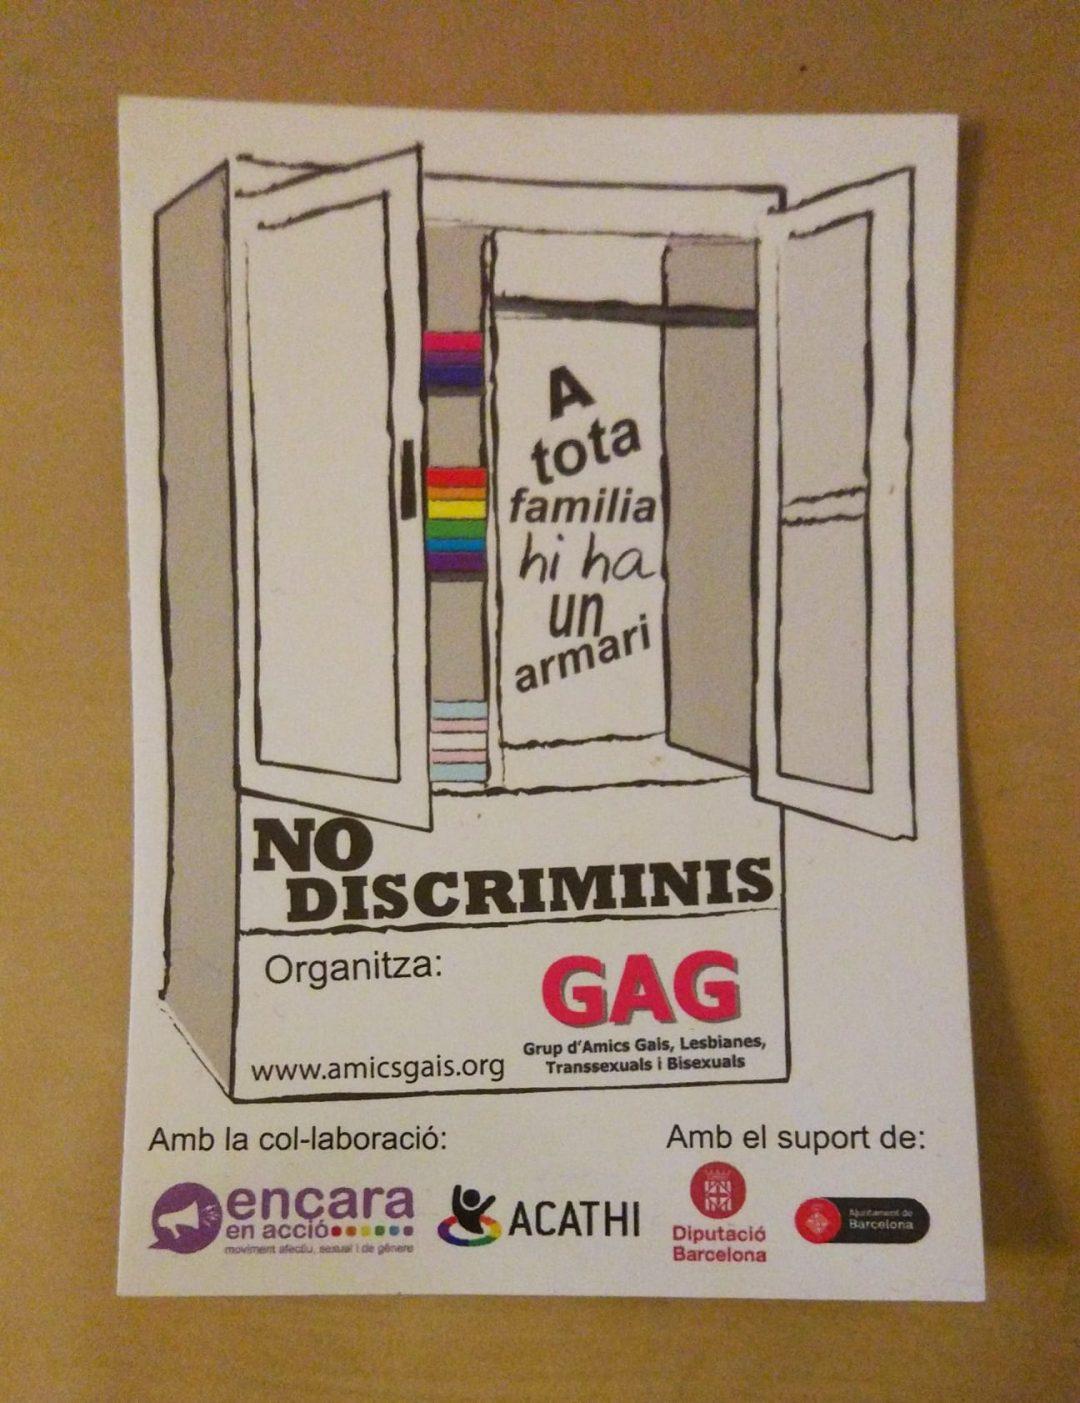 No discriminis